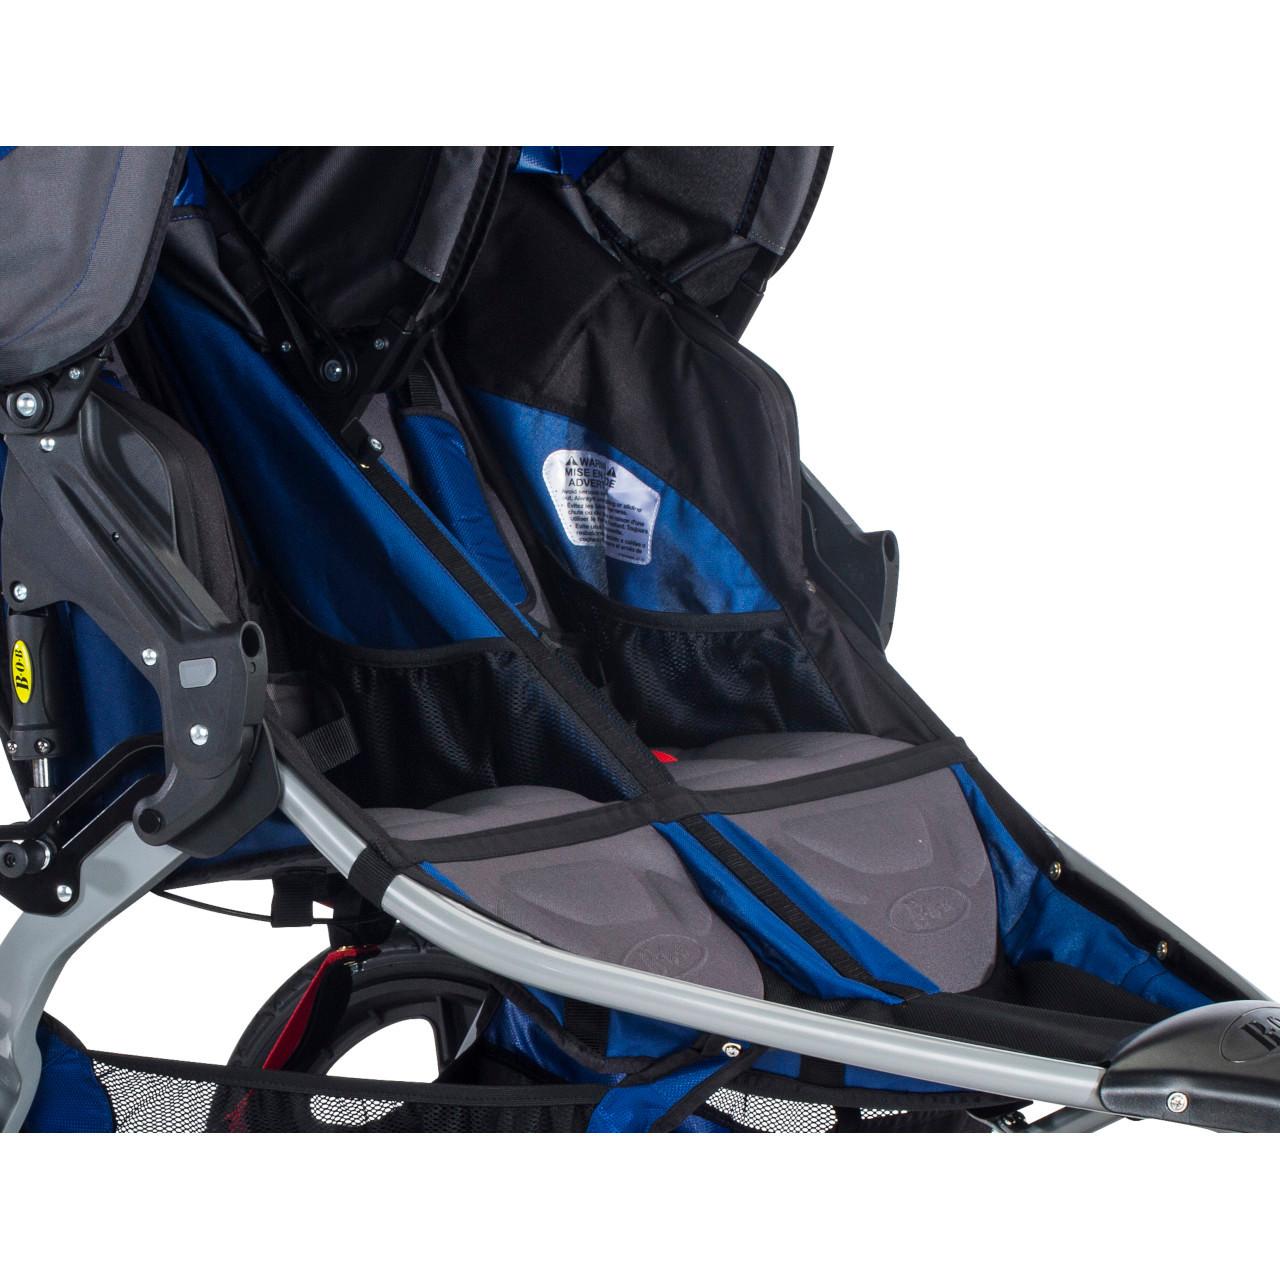 BOB Seat, Stroller Strides, Duallie/Blue 2016